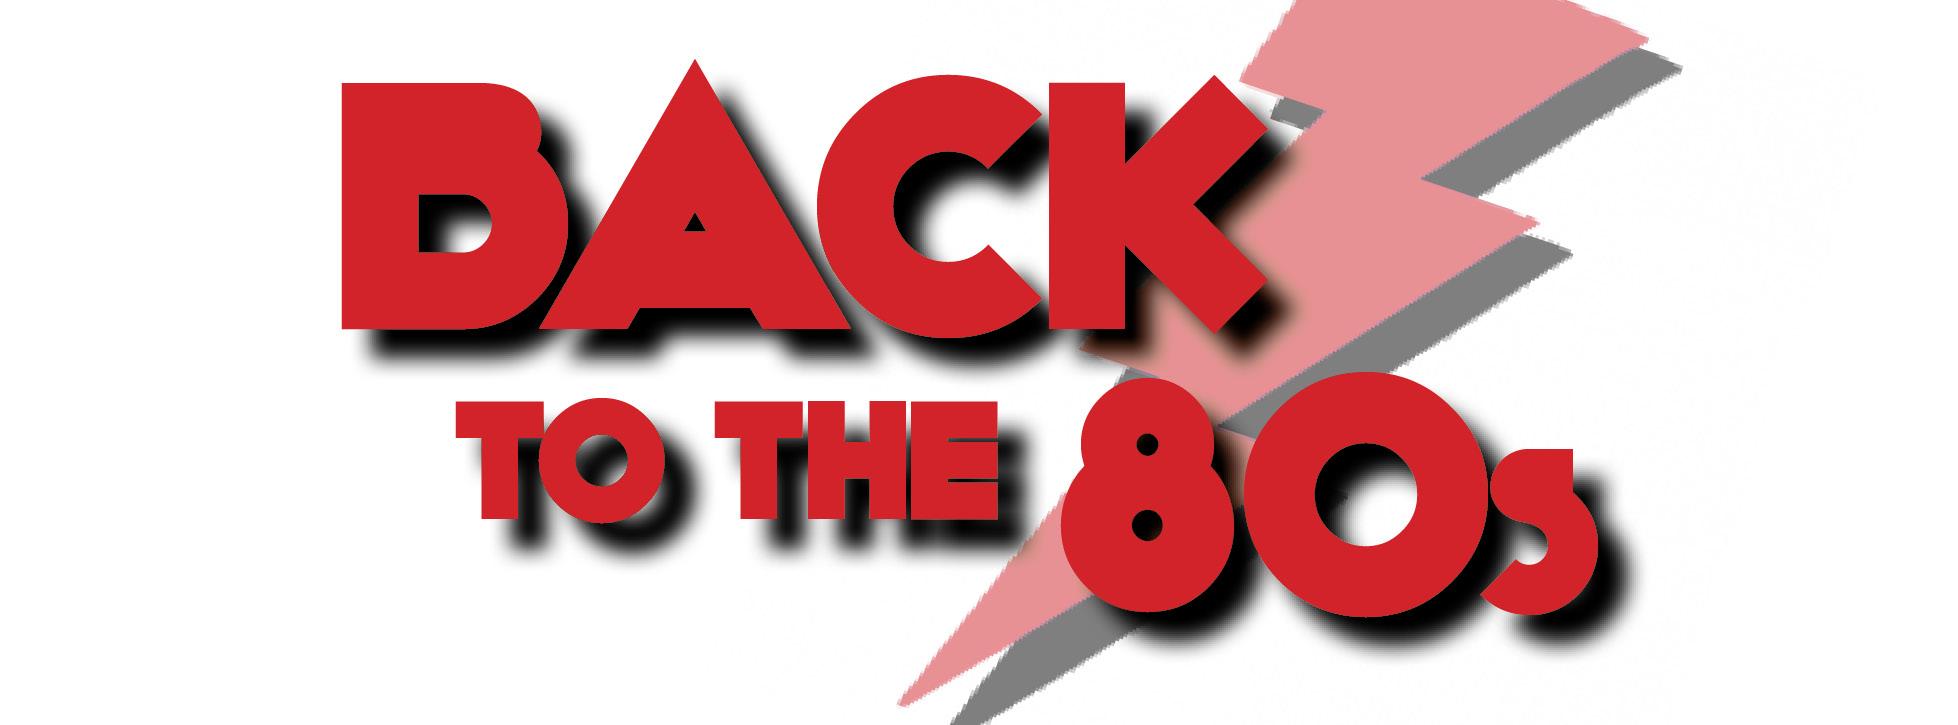 backtothe80s.jpg